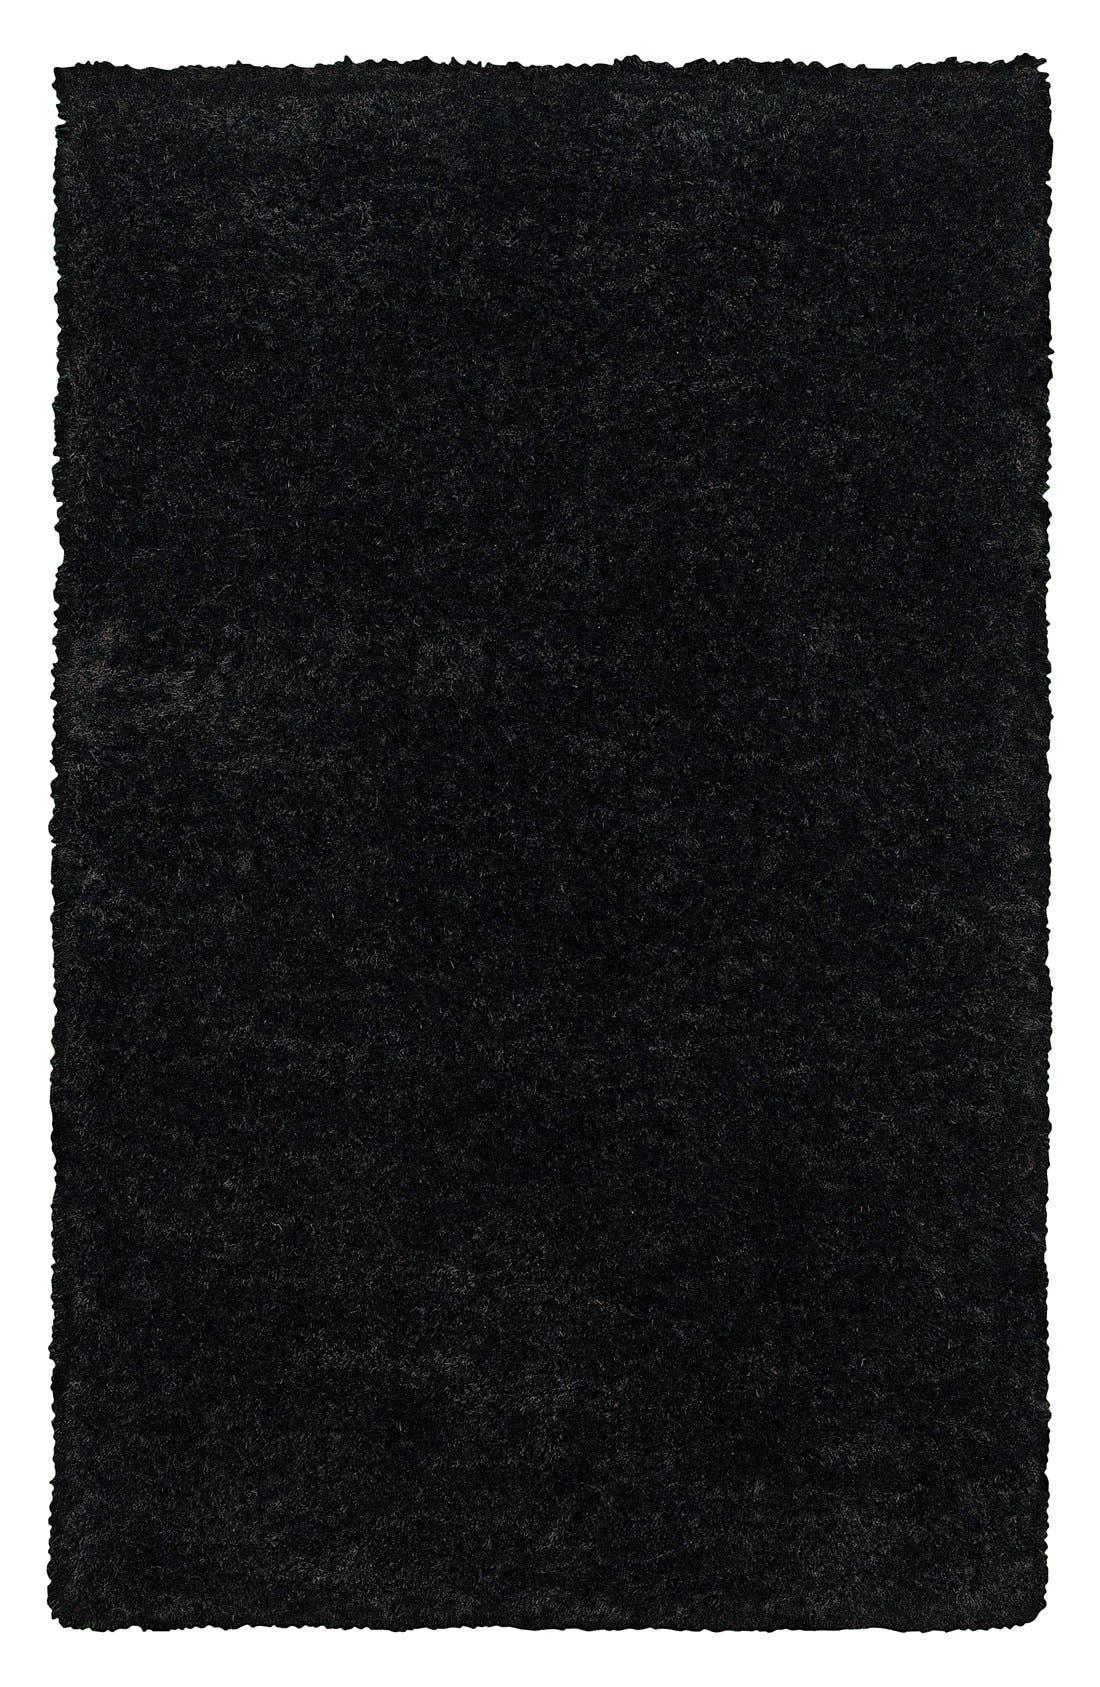 Plush Shag Hand Tufted Area Rug,                             Main thumbnail 1, color,                             001